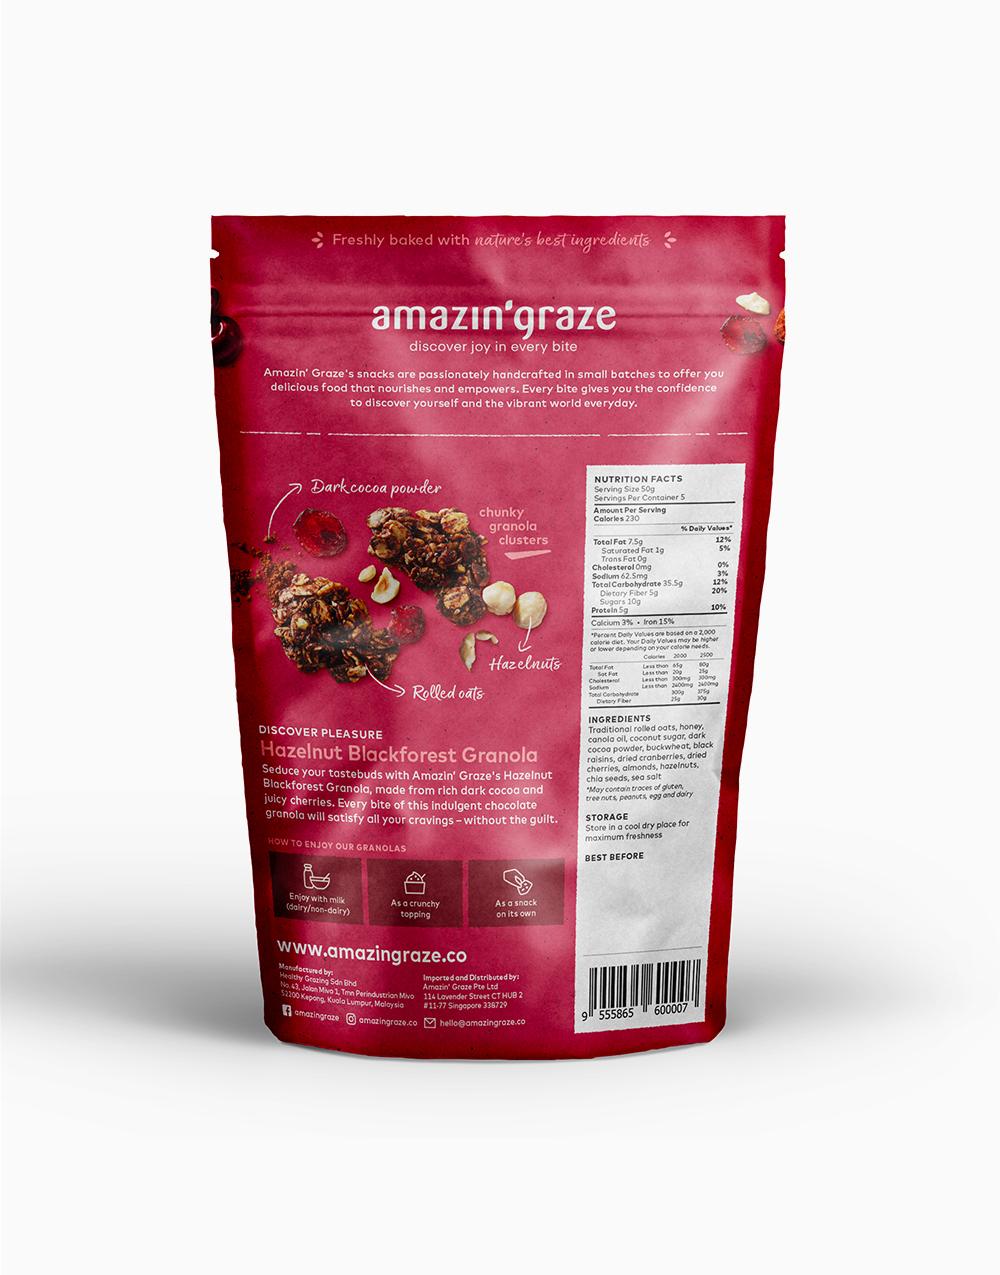 Breakfast Bundle: Blueberry & Hazelnut by Amazin' Graze